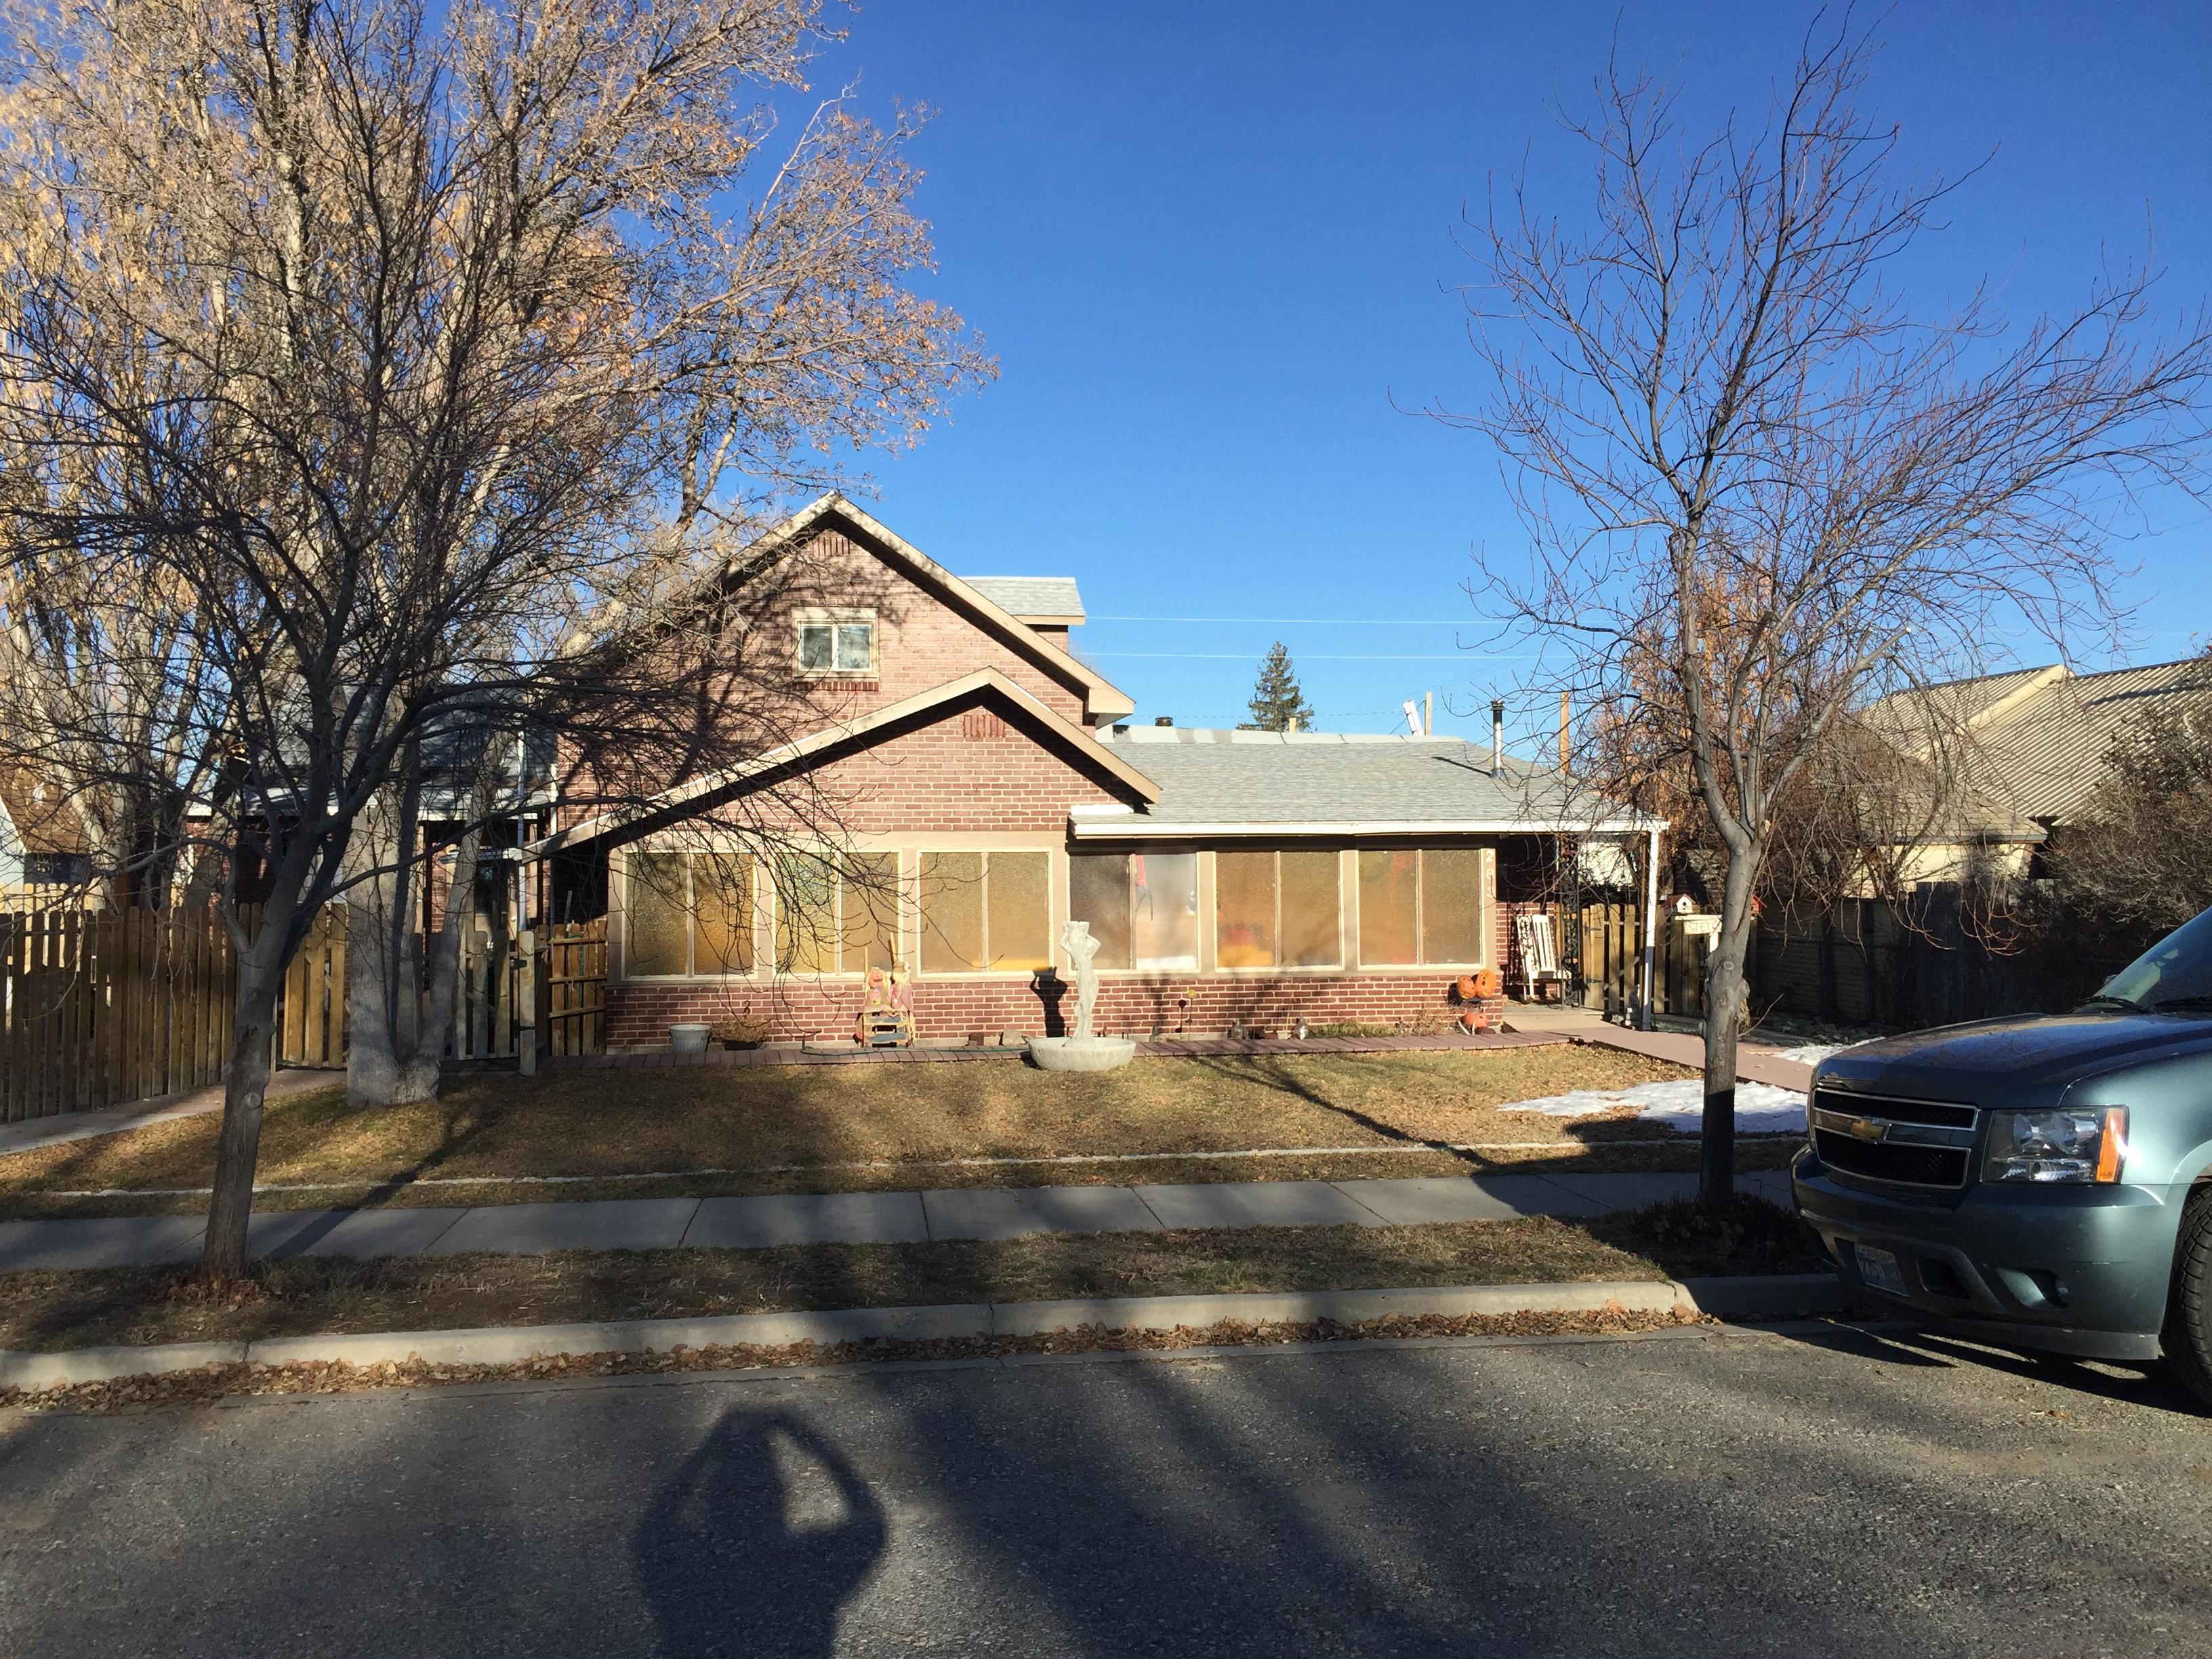 271 Fourth St, Wells, Nevada 89835